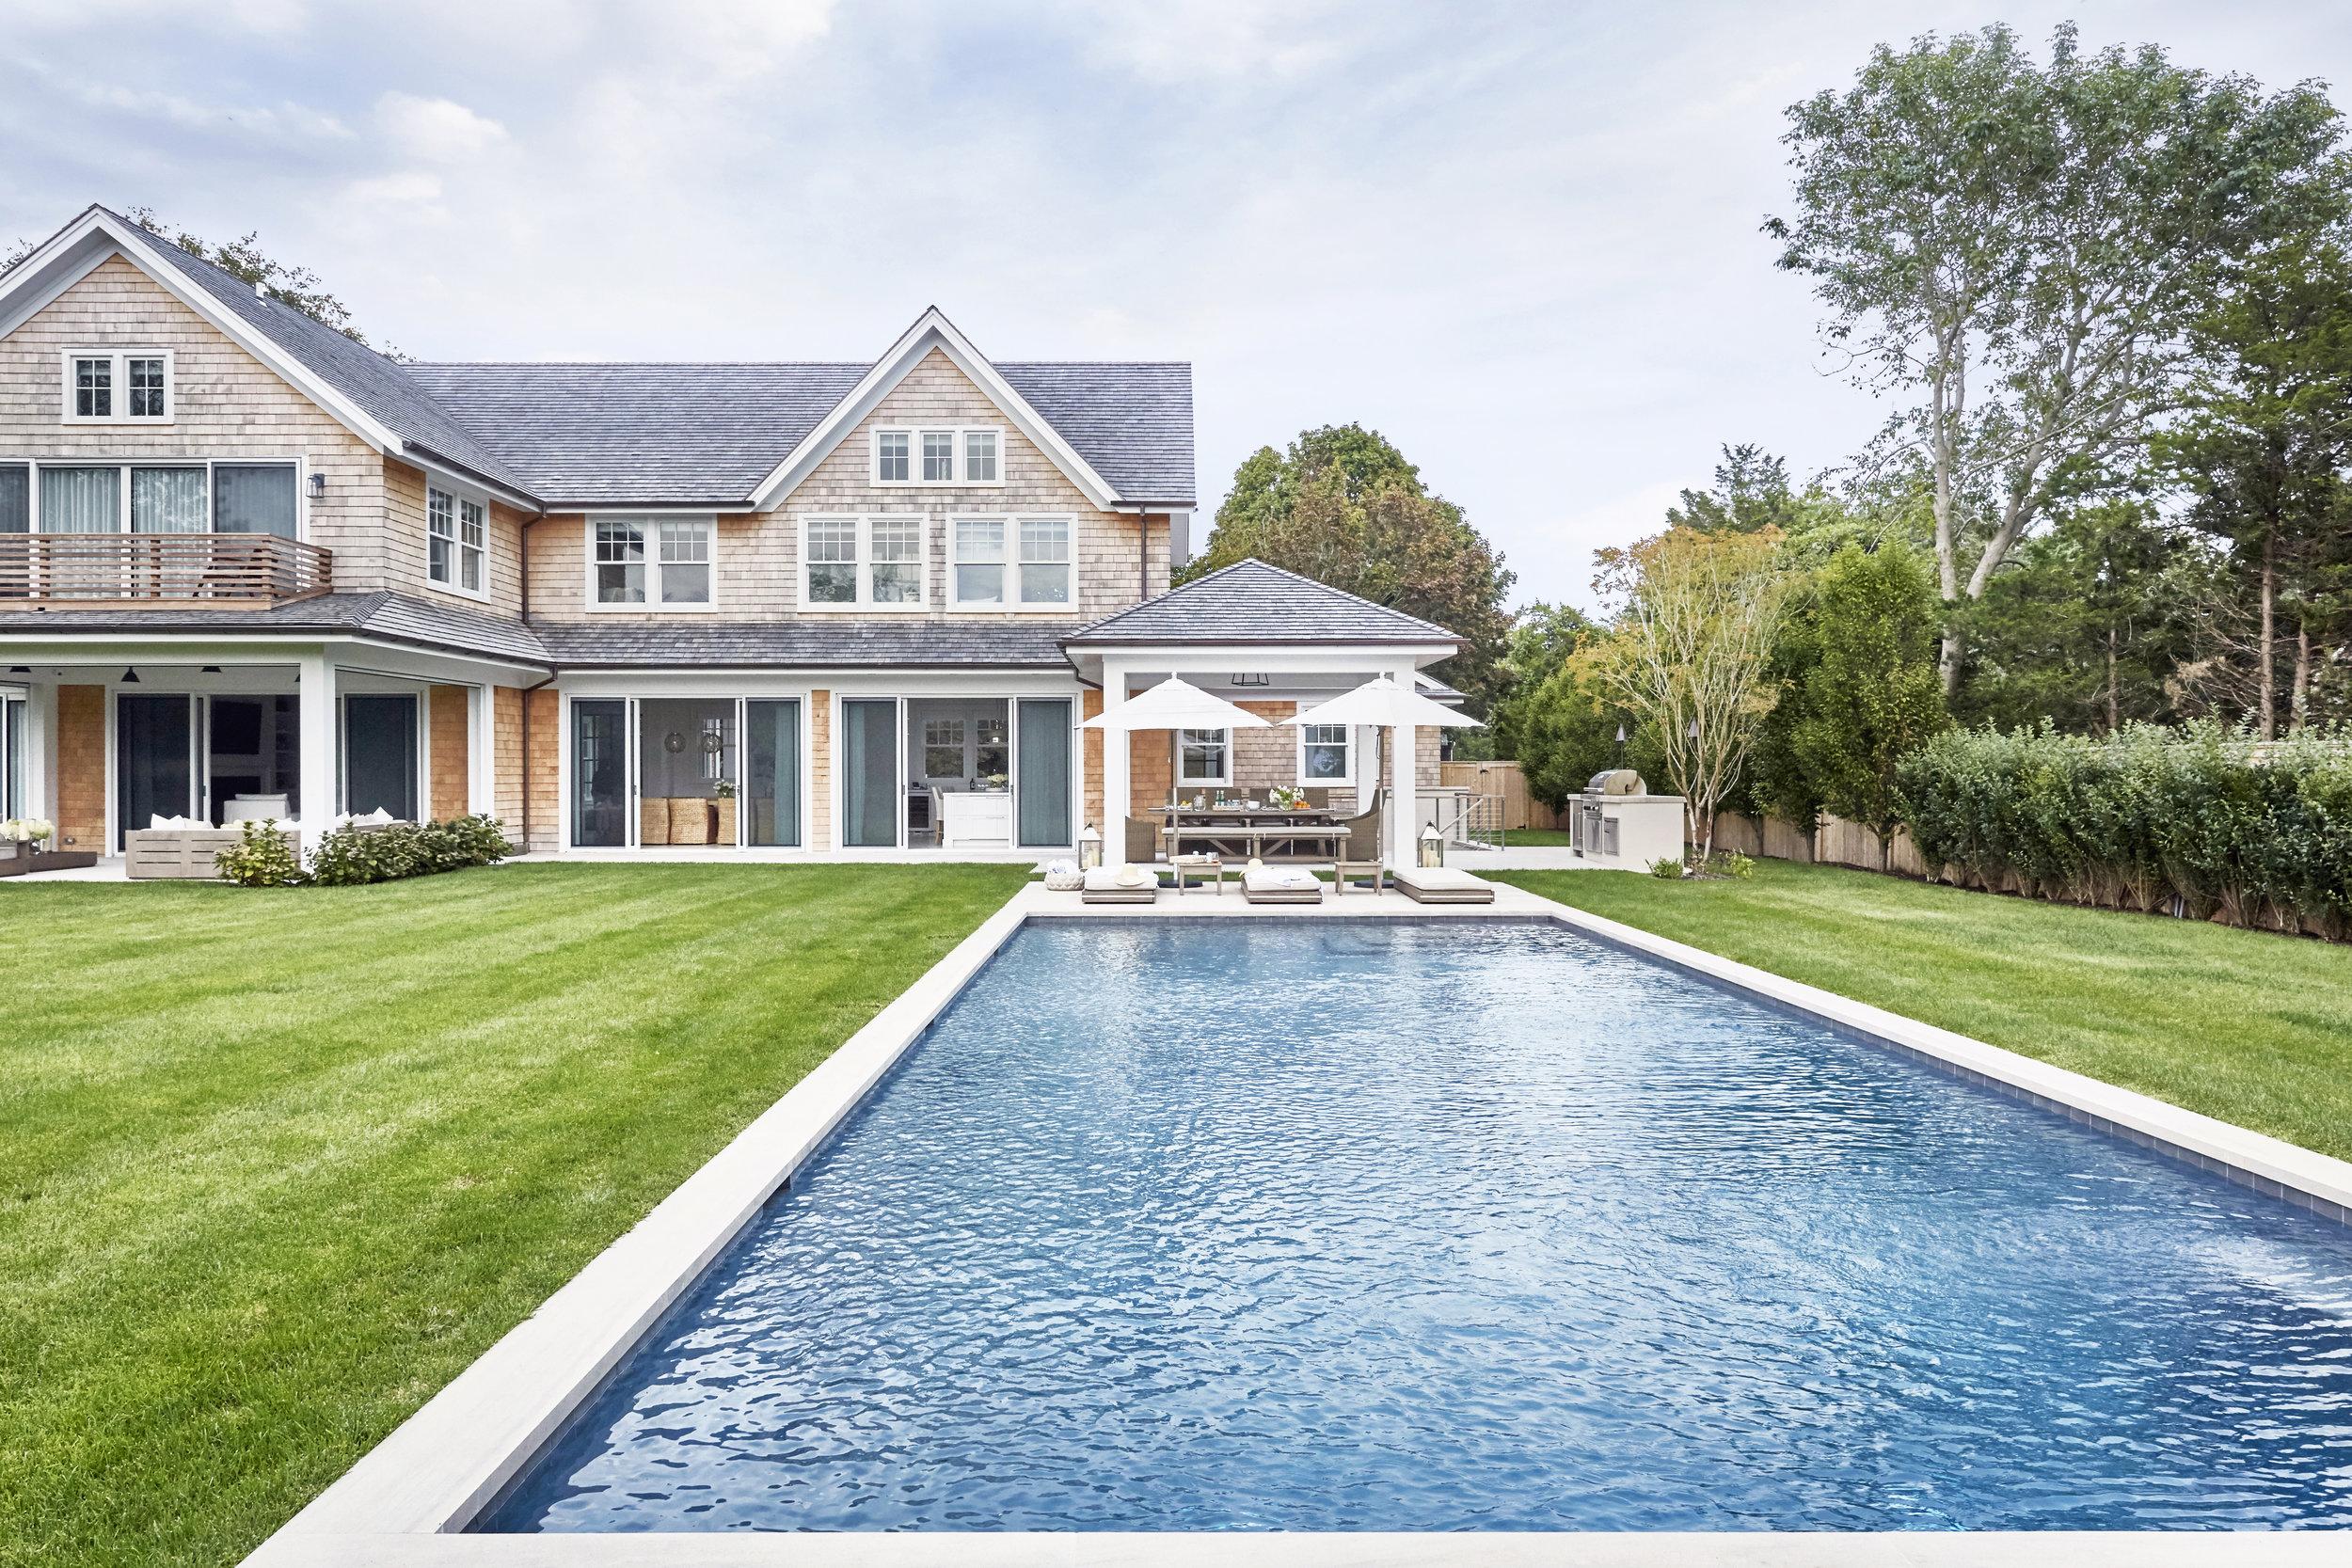 20. Amagansett Beach House by Chango & Co.jpg